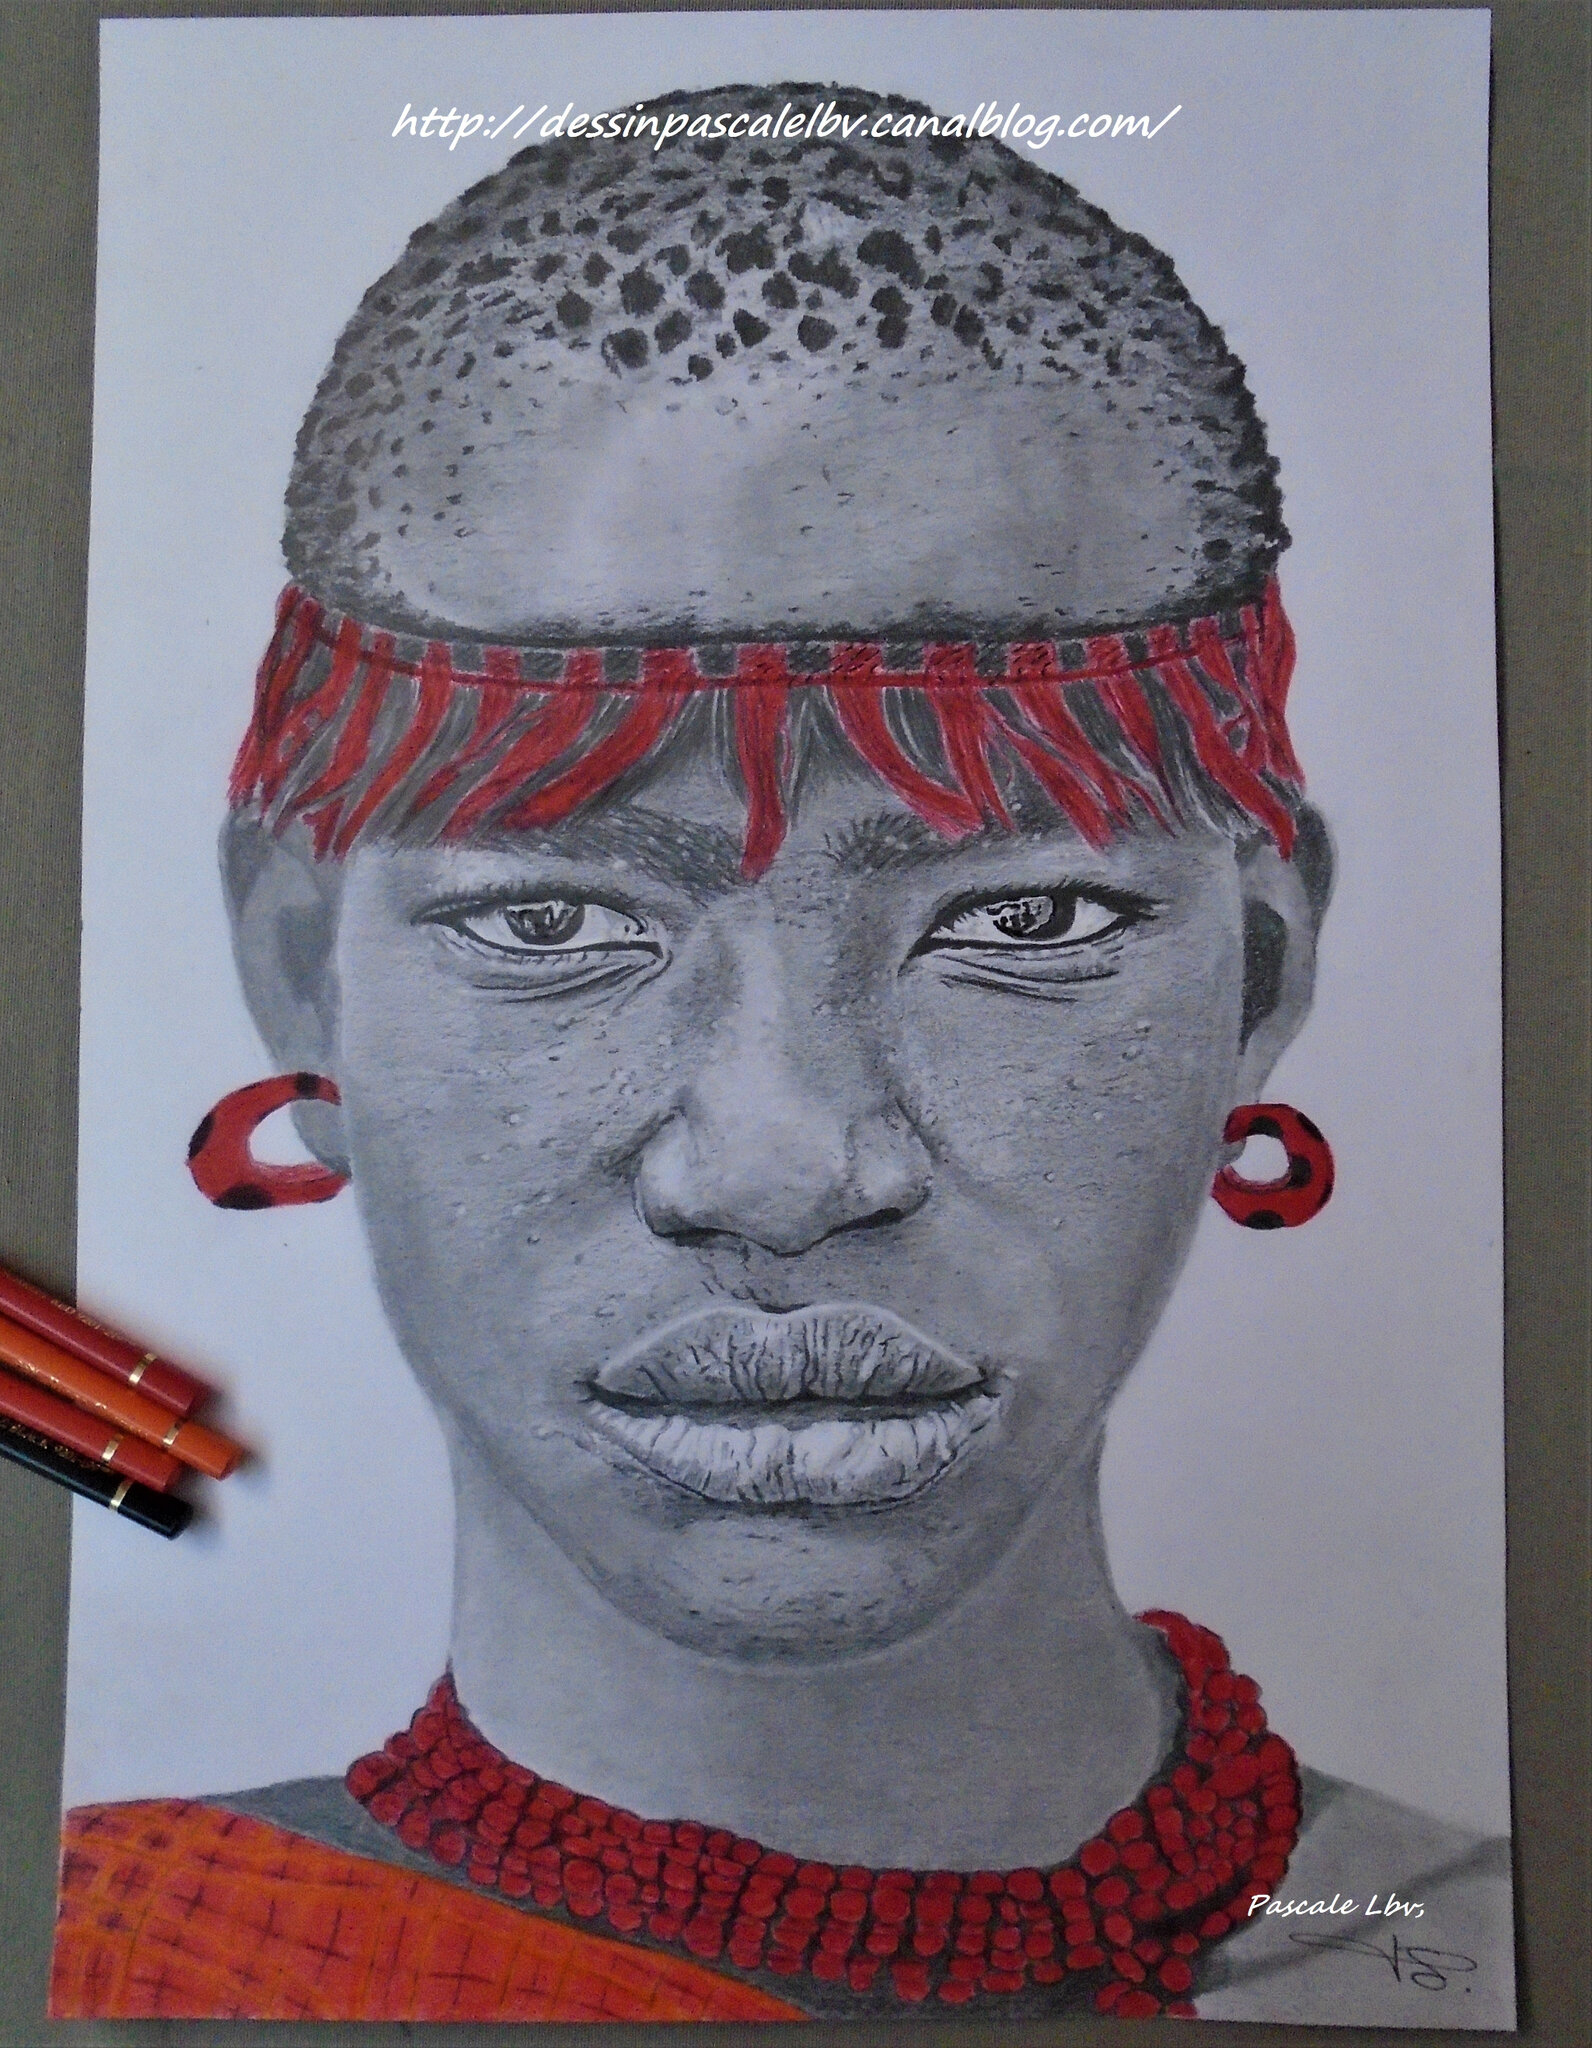 189 - Femme de la tribu Bodi 30X40 DISPONIBLE